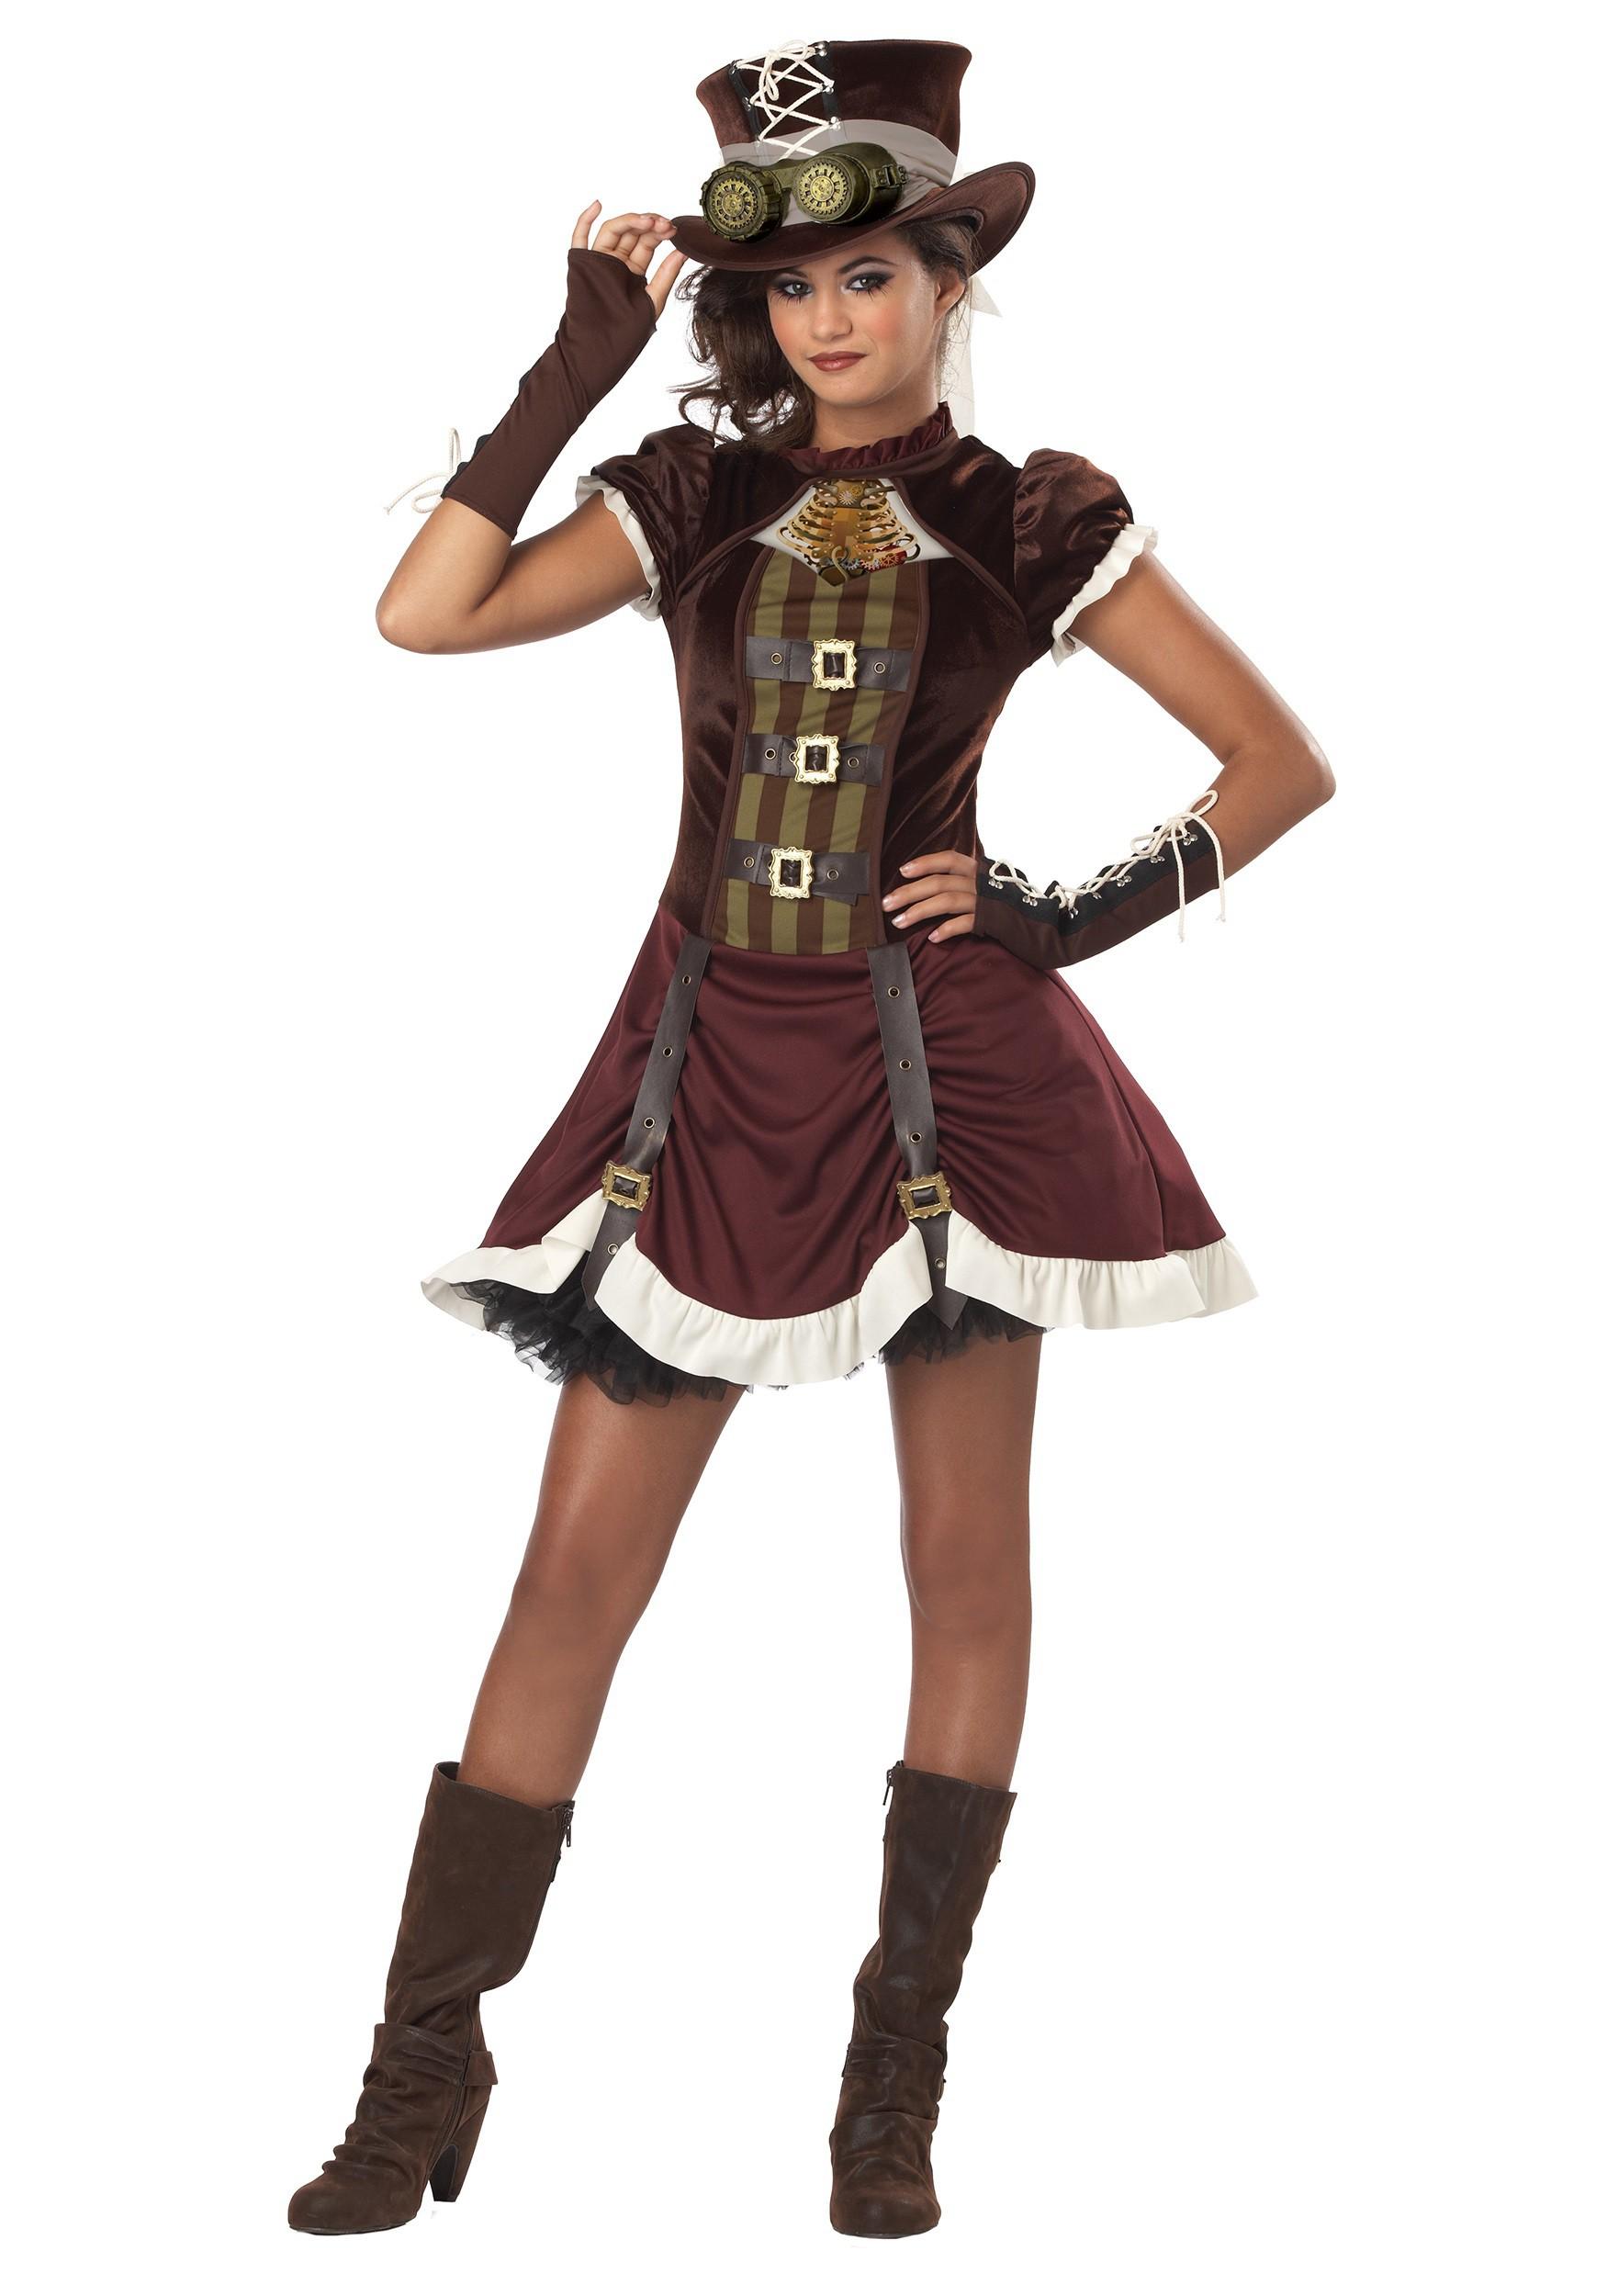 Tween Steampunk Costume For Girls